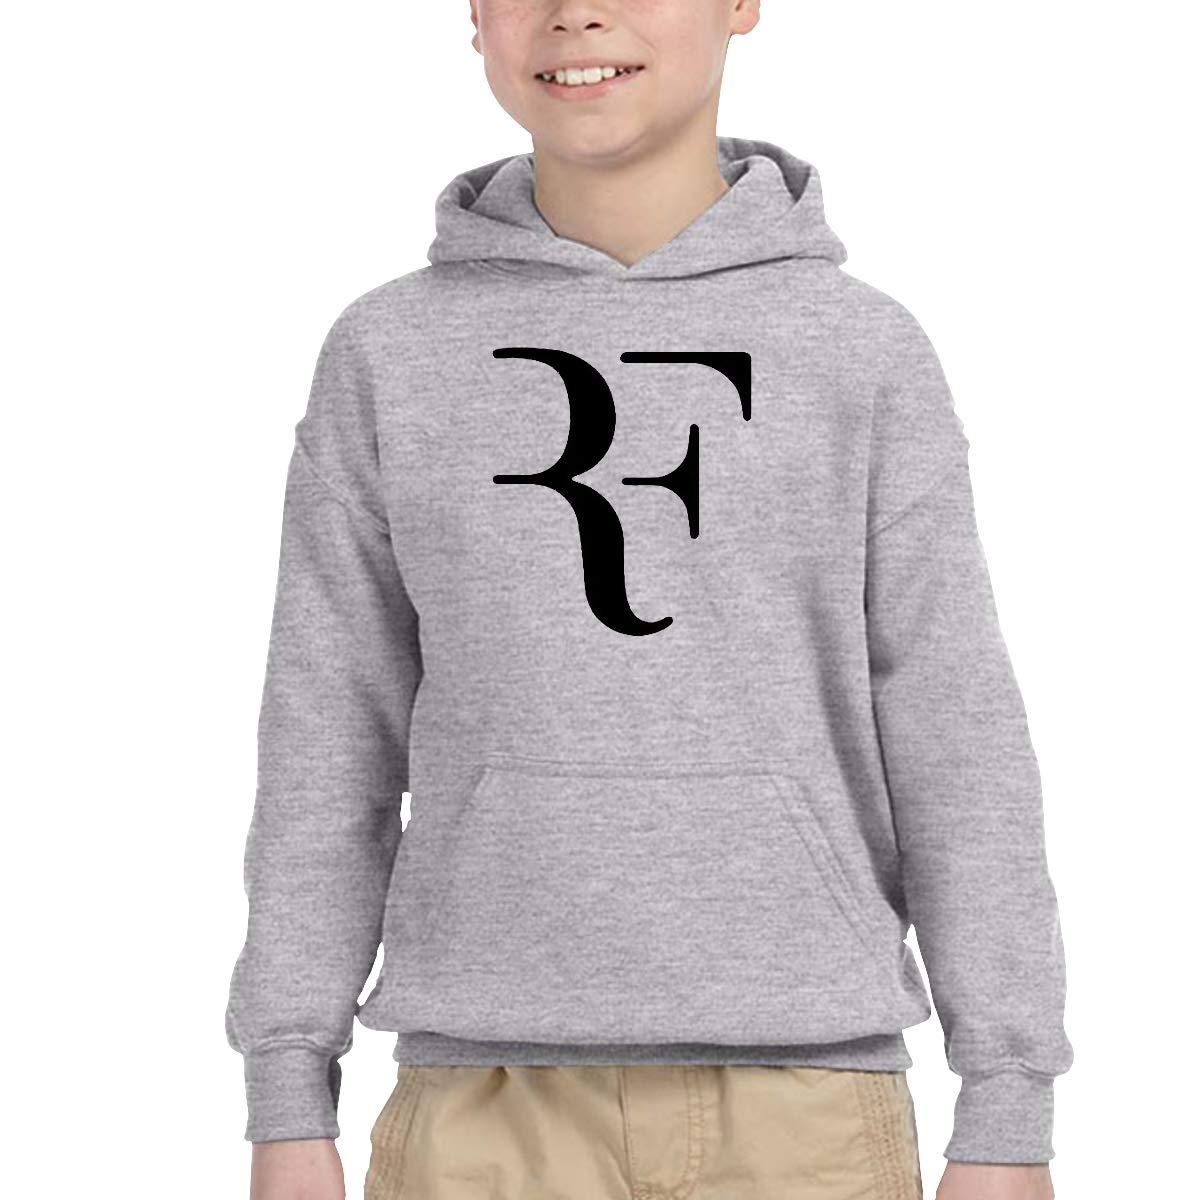 2-6 Year Old Childrens Hooded Pocket Sweater Roger Federer Original Retro Literary Design Gray